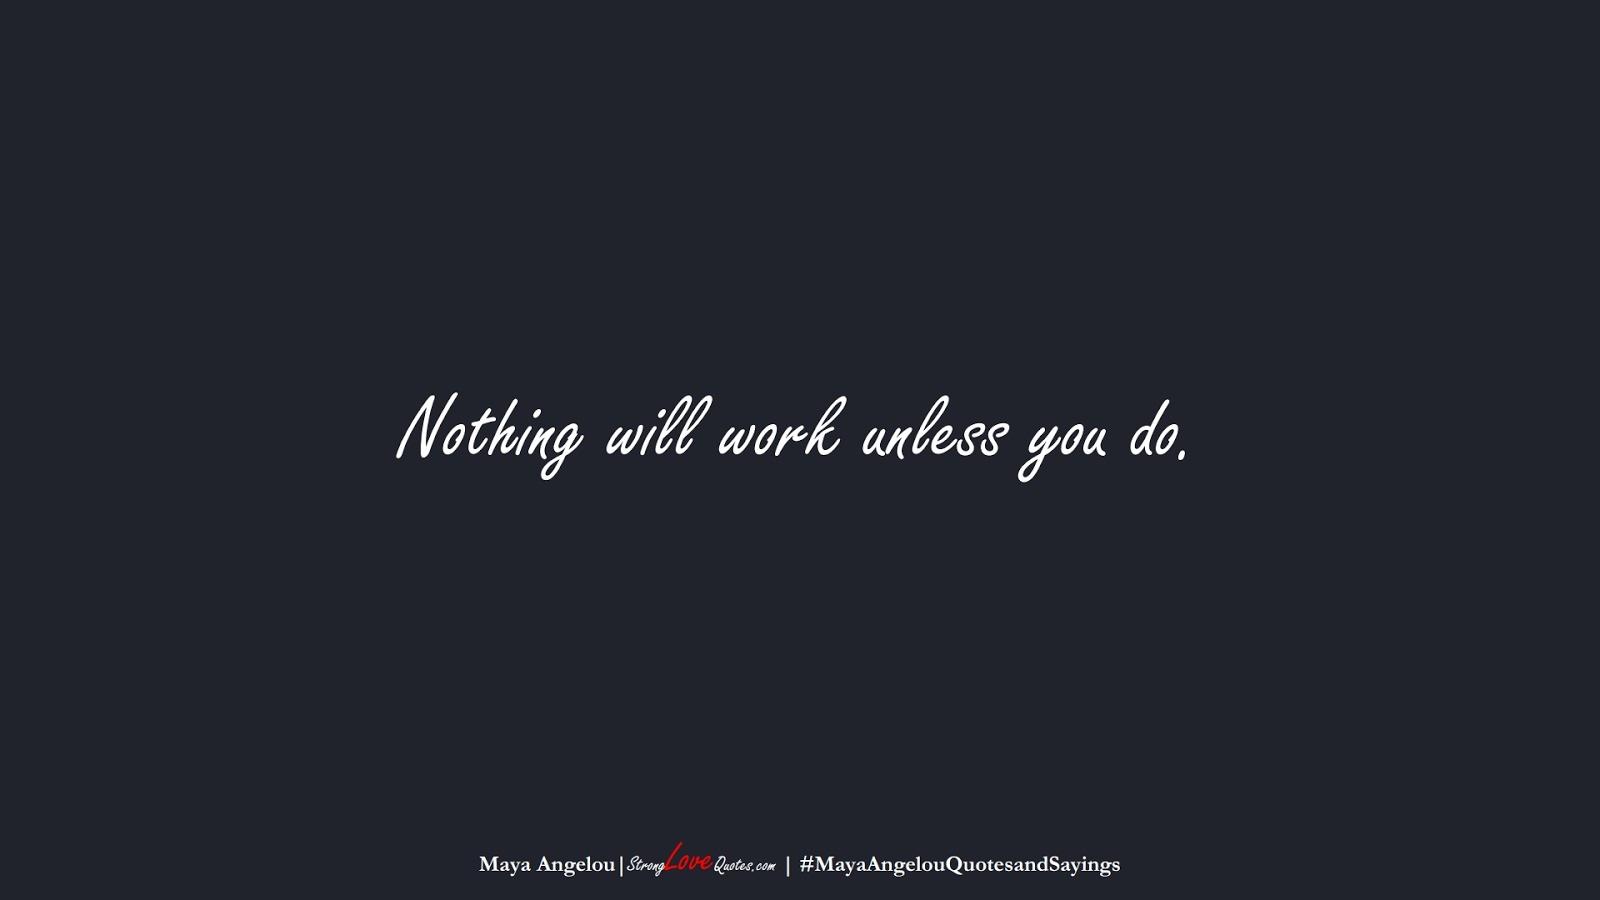 Nothing will work unless you do. (Maya Angelou);  #MayaAngelouQuotesandSayings